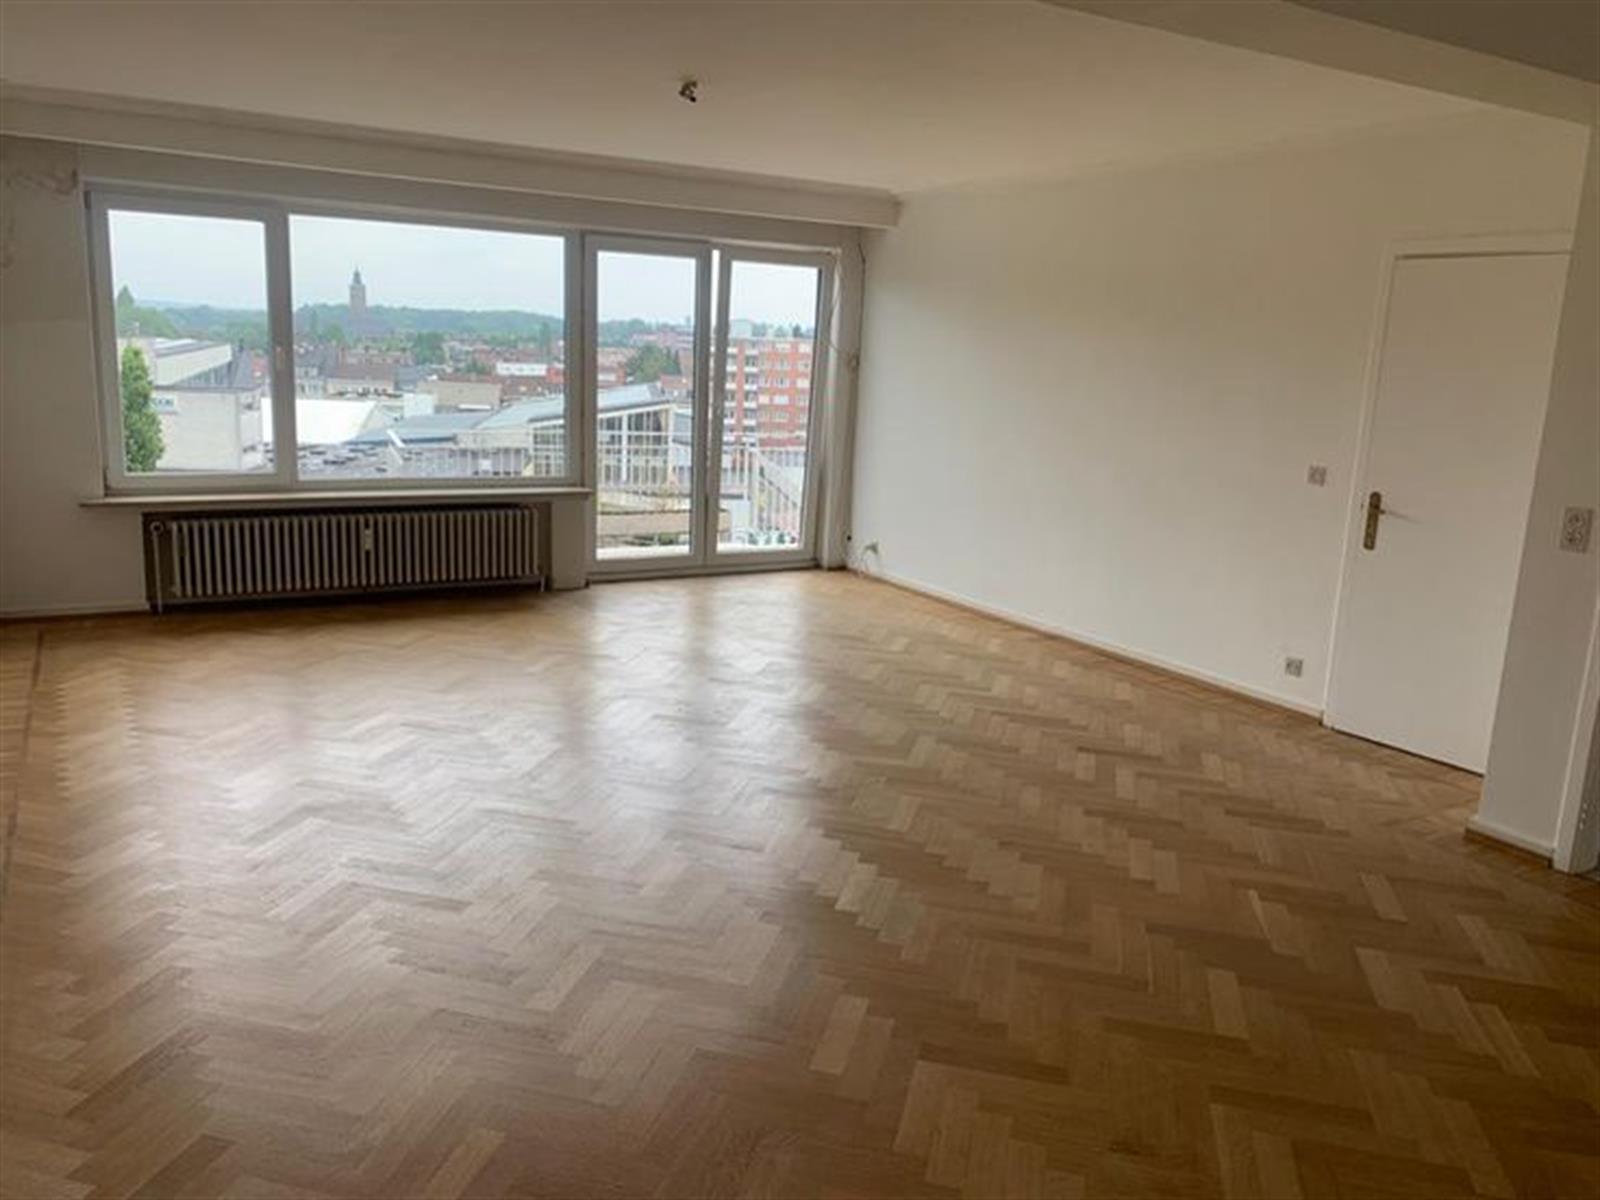 Appartement - Woluwe-Saint-Lambert - #4399349-0